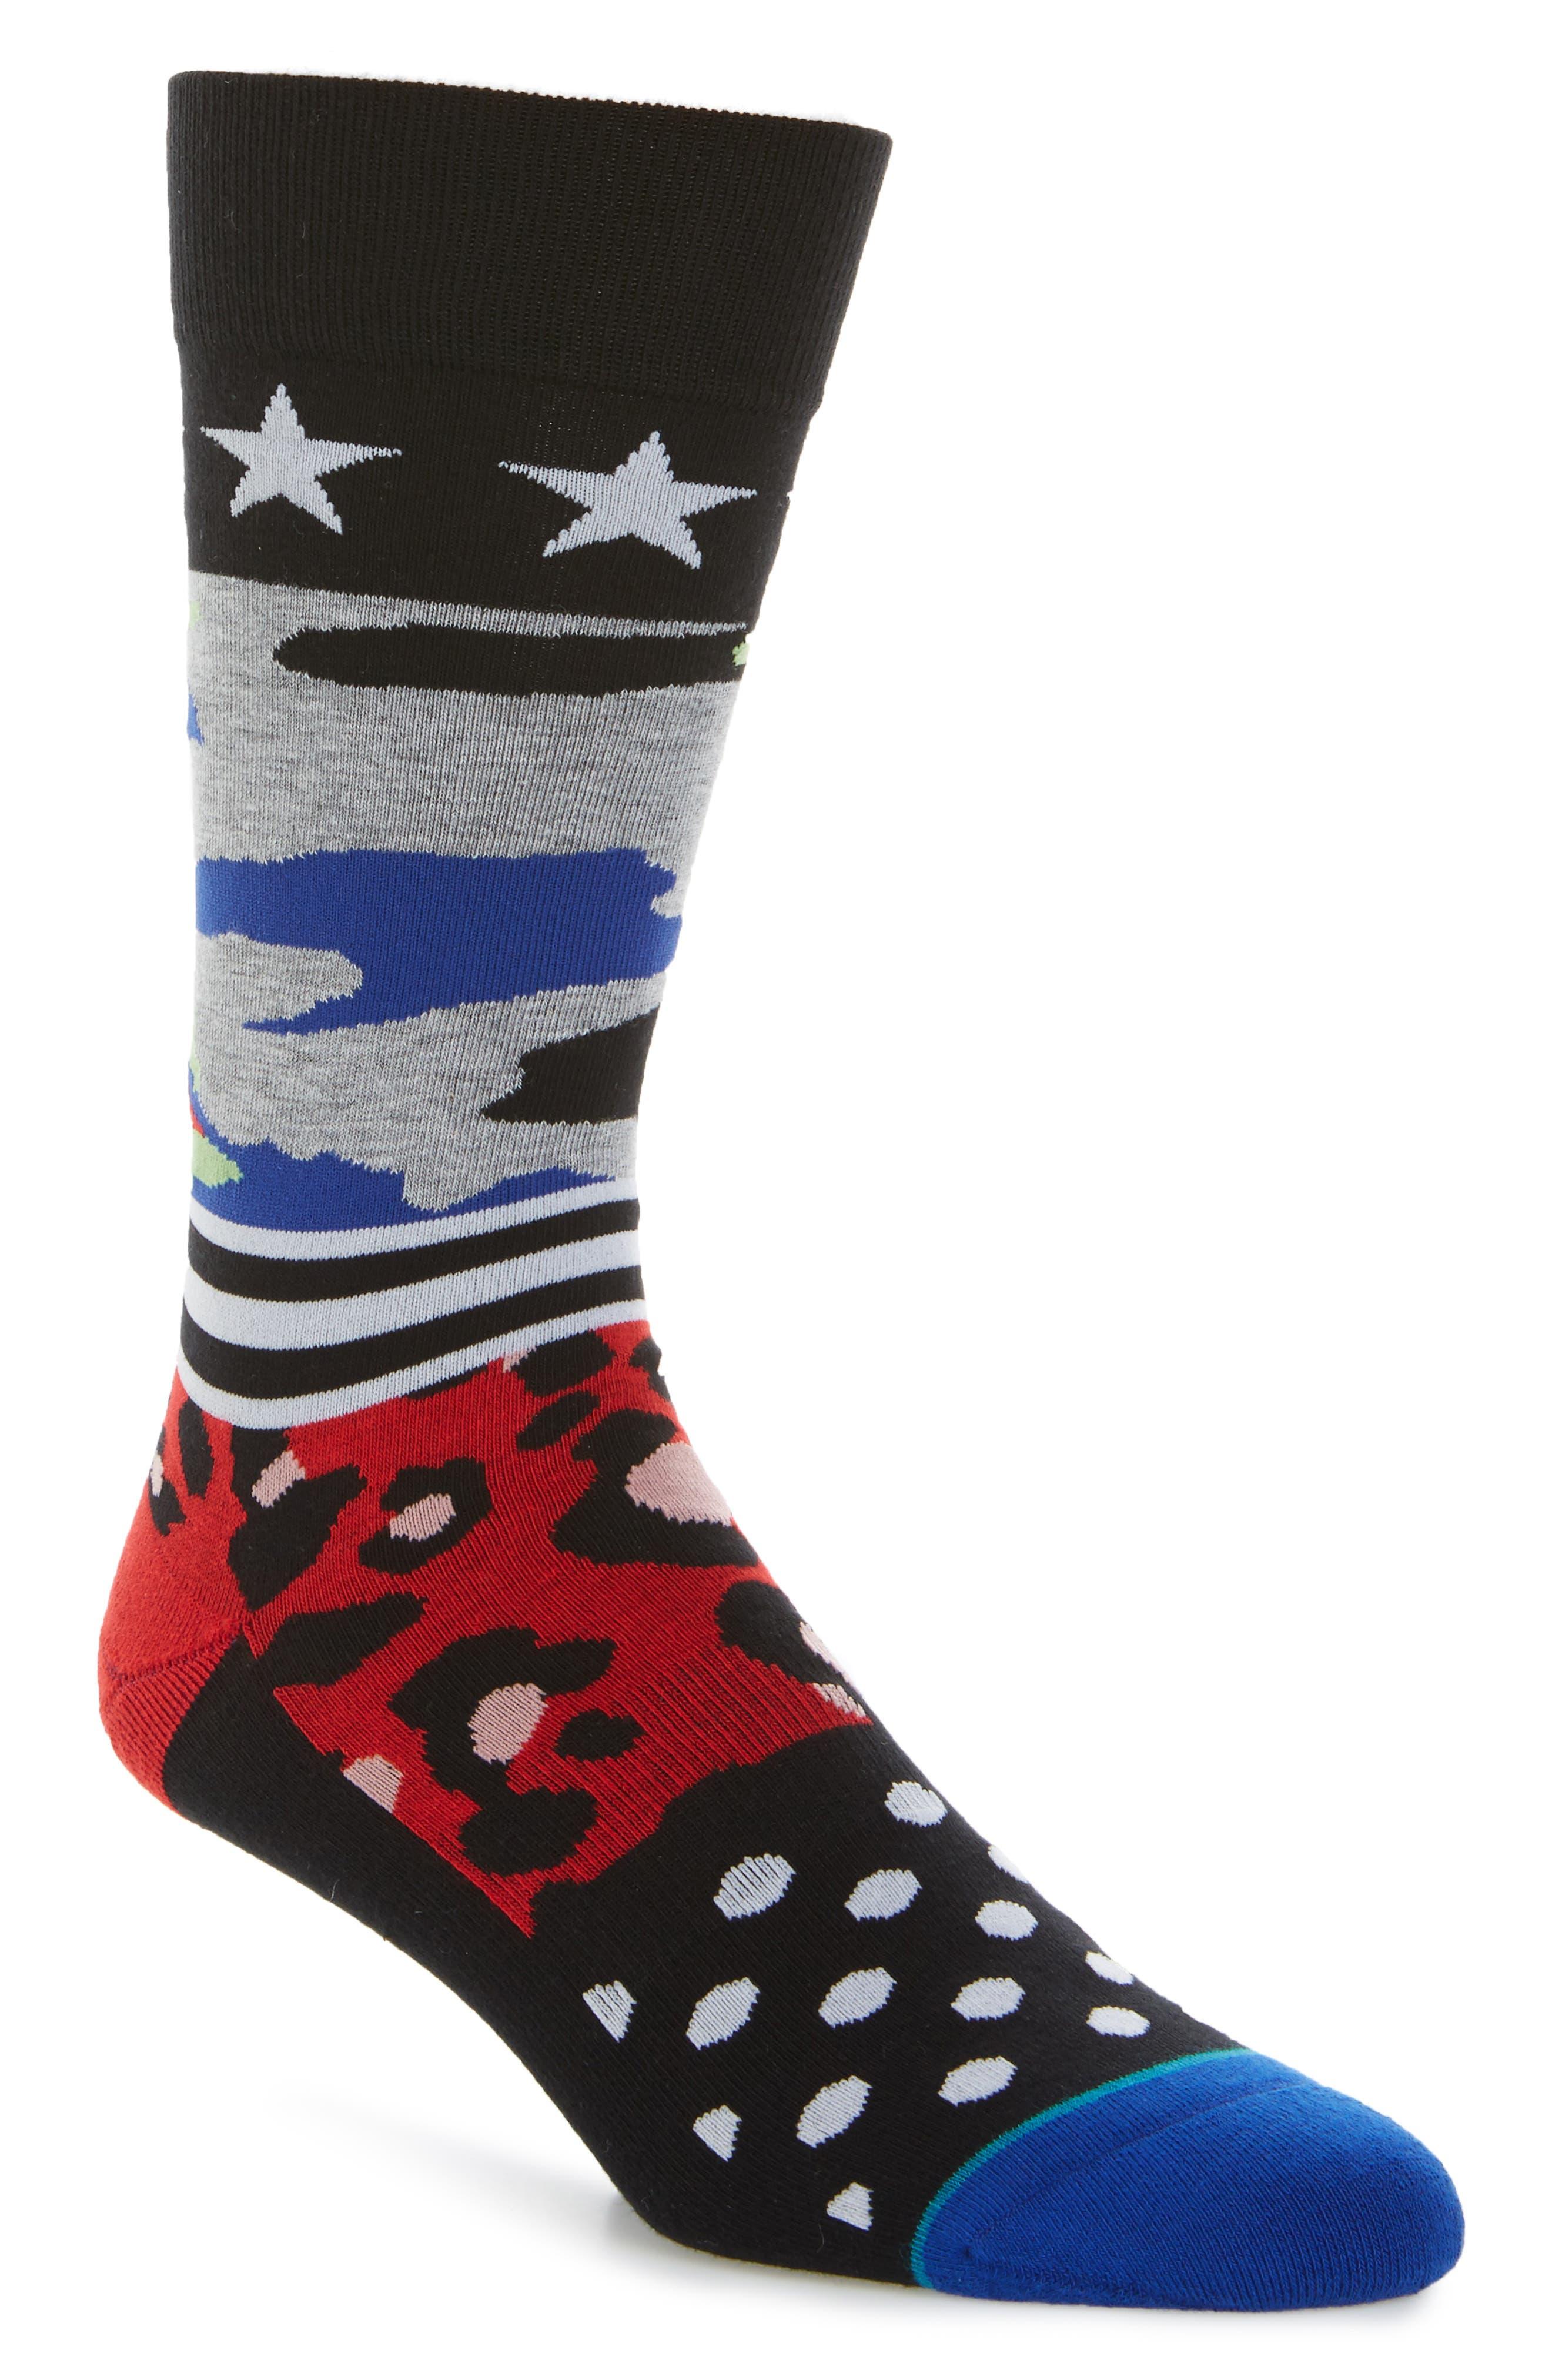 Harden Mixer Socks,                             Main thumbnail 1, color,                             006